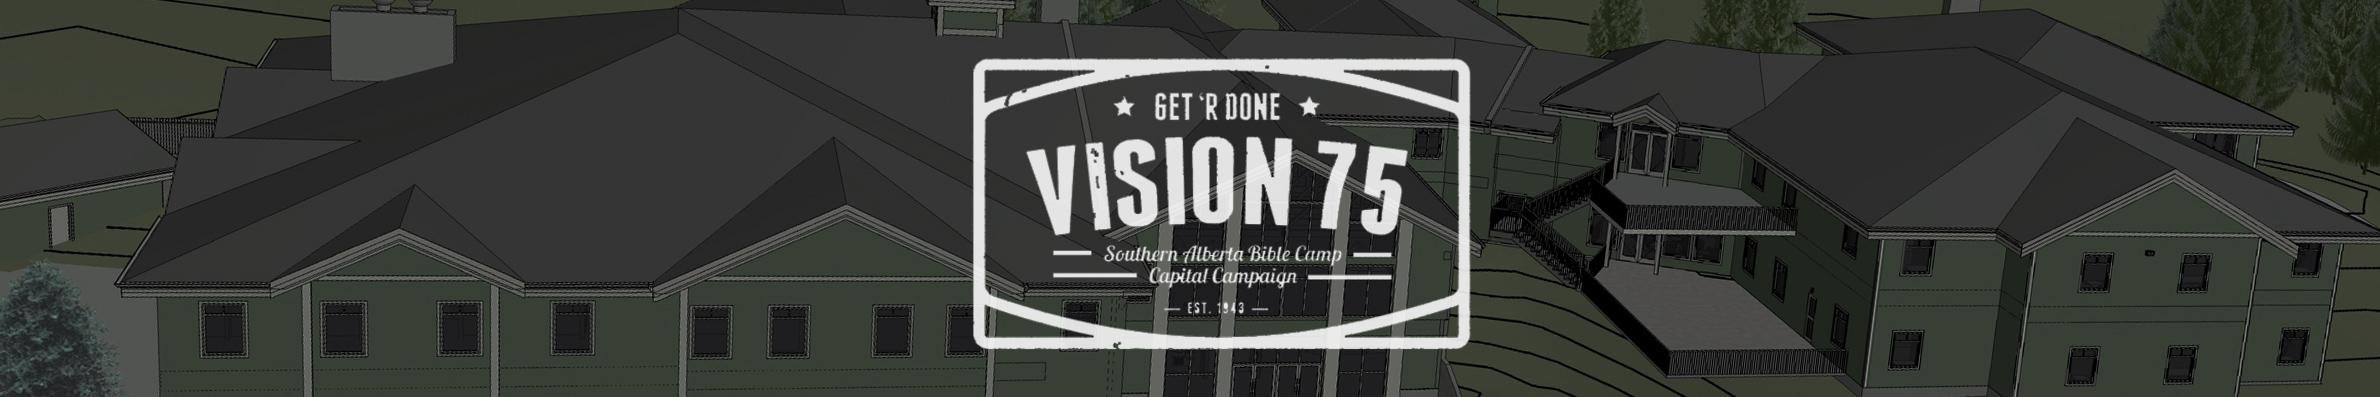 Vision 75 Campaign SABC